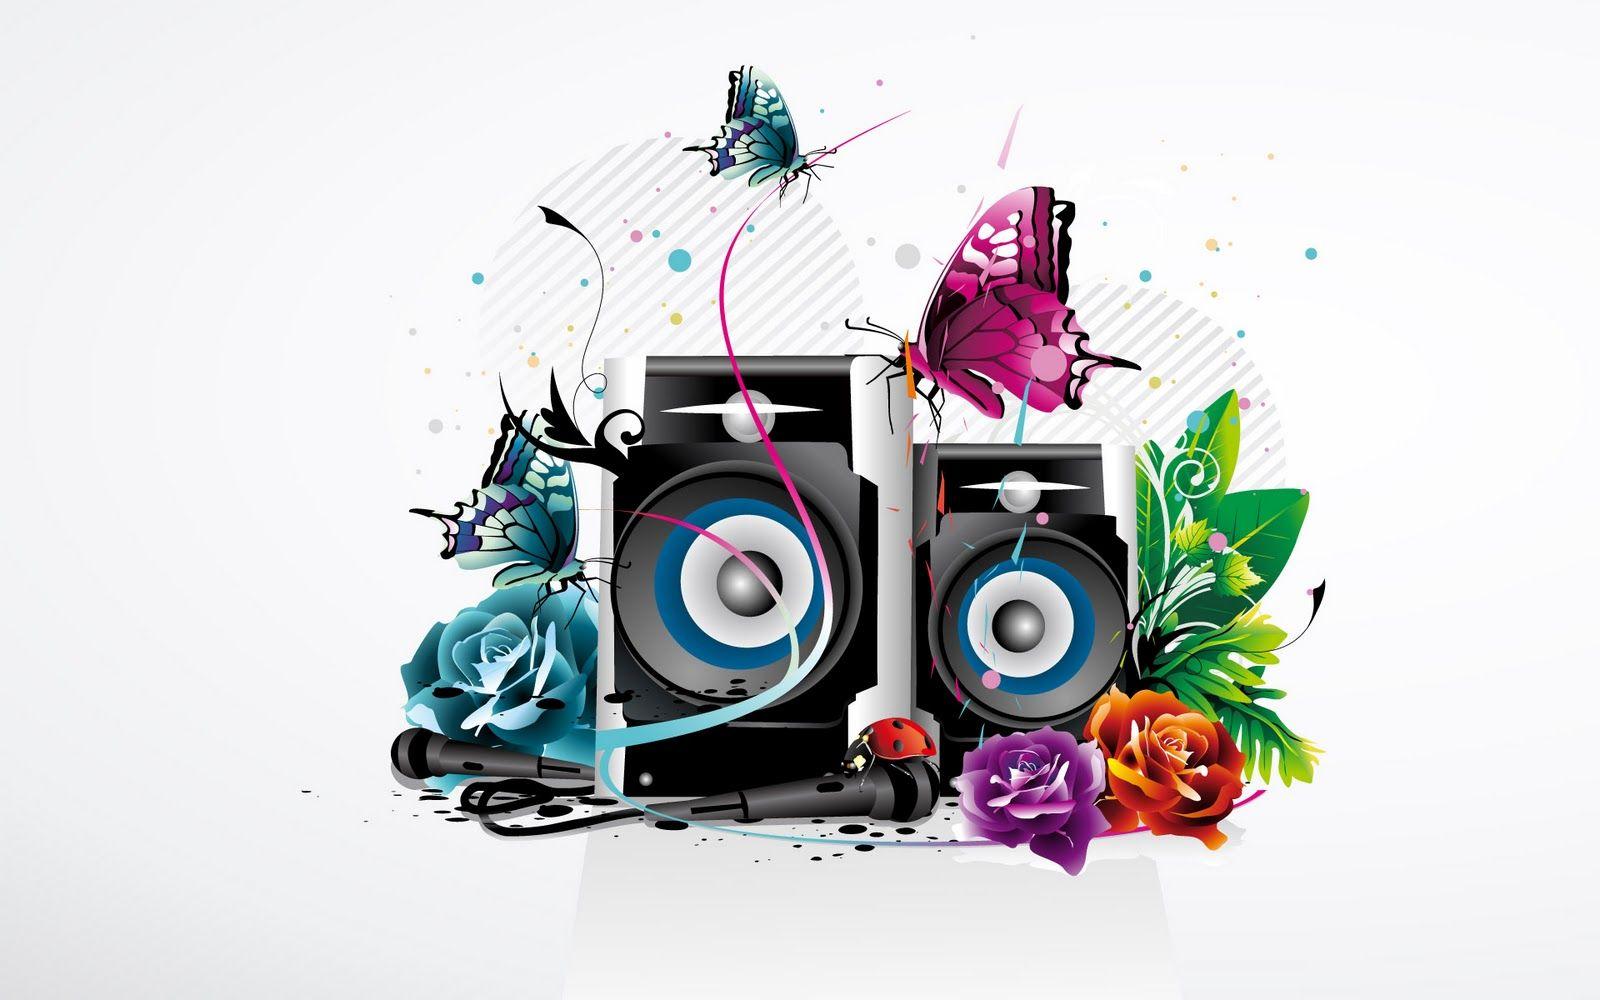 Pin by hari charan on HCB ART | Speaker wallpaper, Music ...